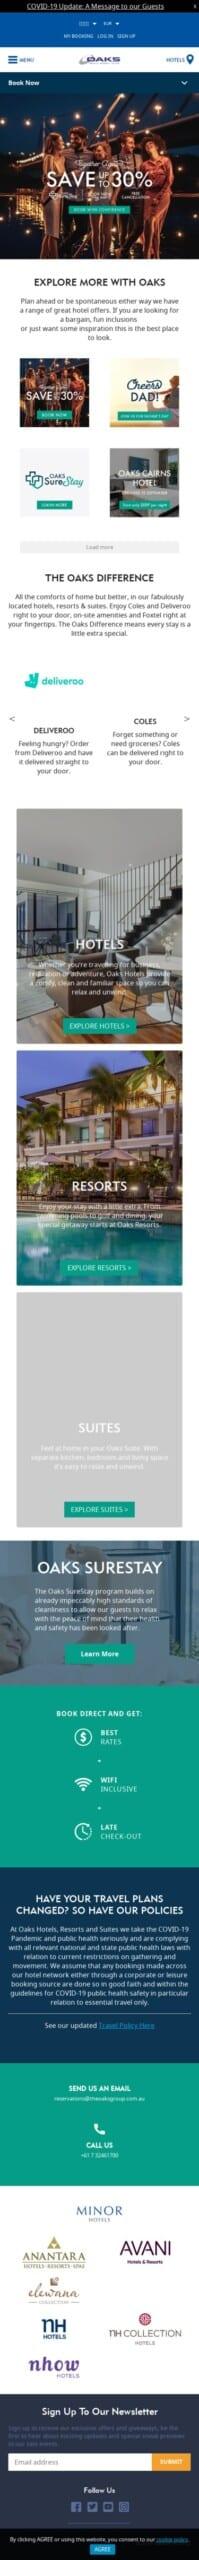 Oaks Hotels & Resorts Coupon